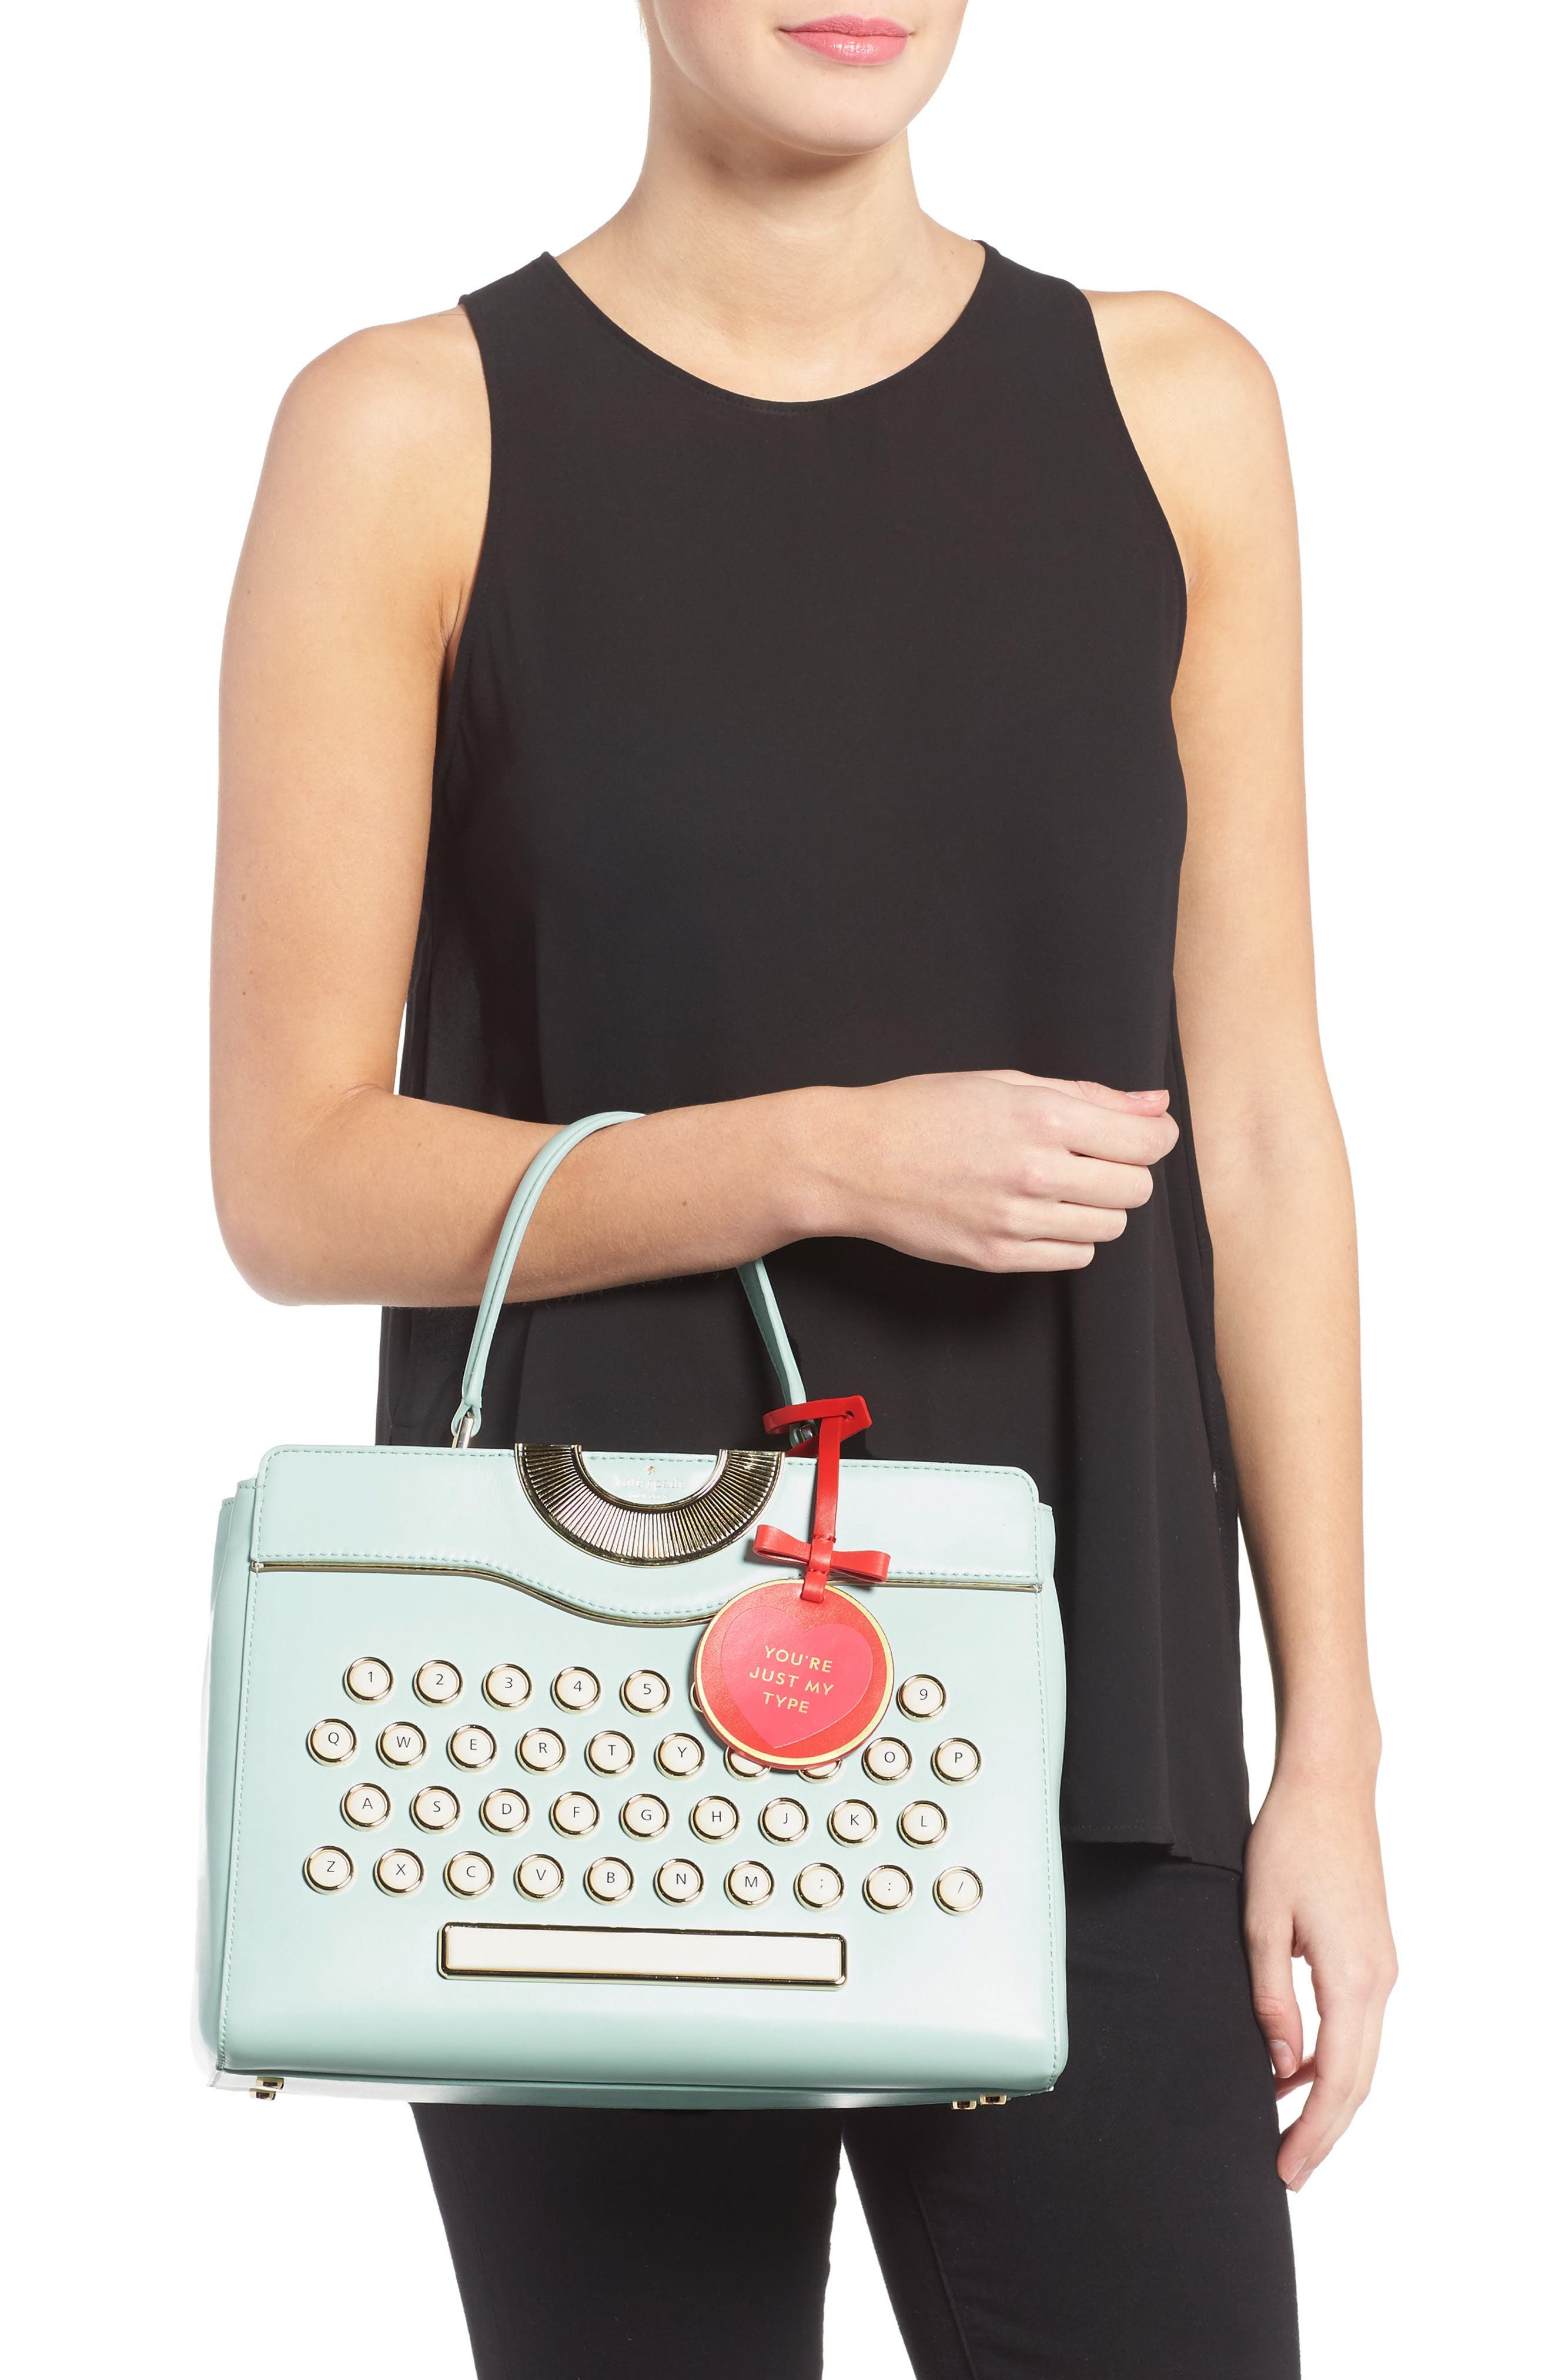 be mine - typewriter leather satchel,                             Alternate thumbnail 2, color,                             474